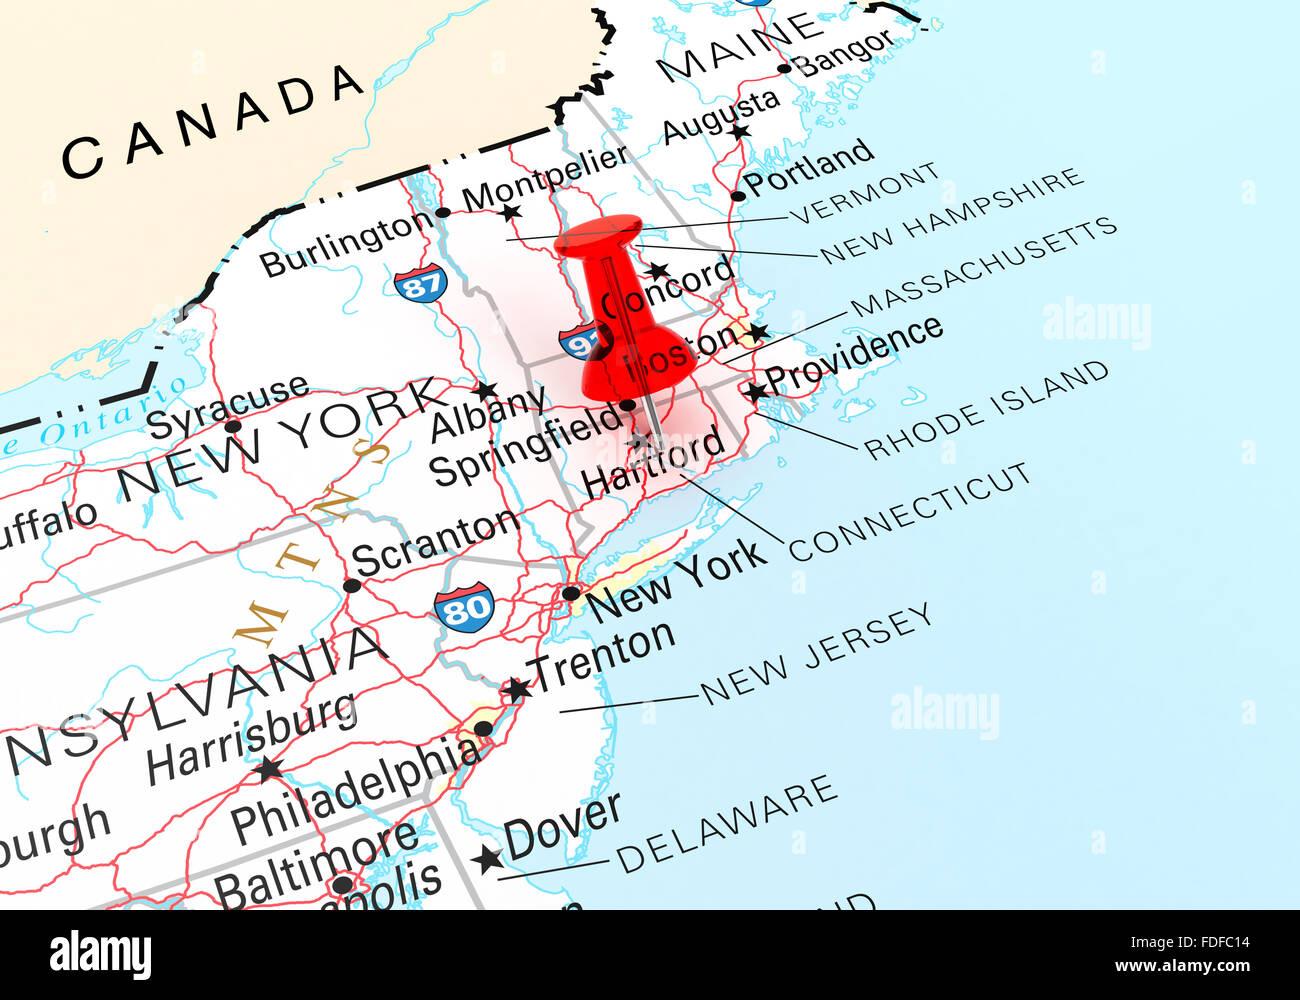 Connecticut Map Stock Photos & Connecticut Map Stock Images - Alamy